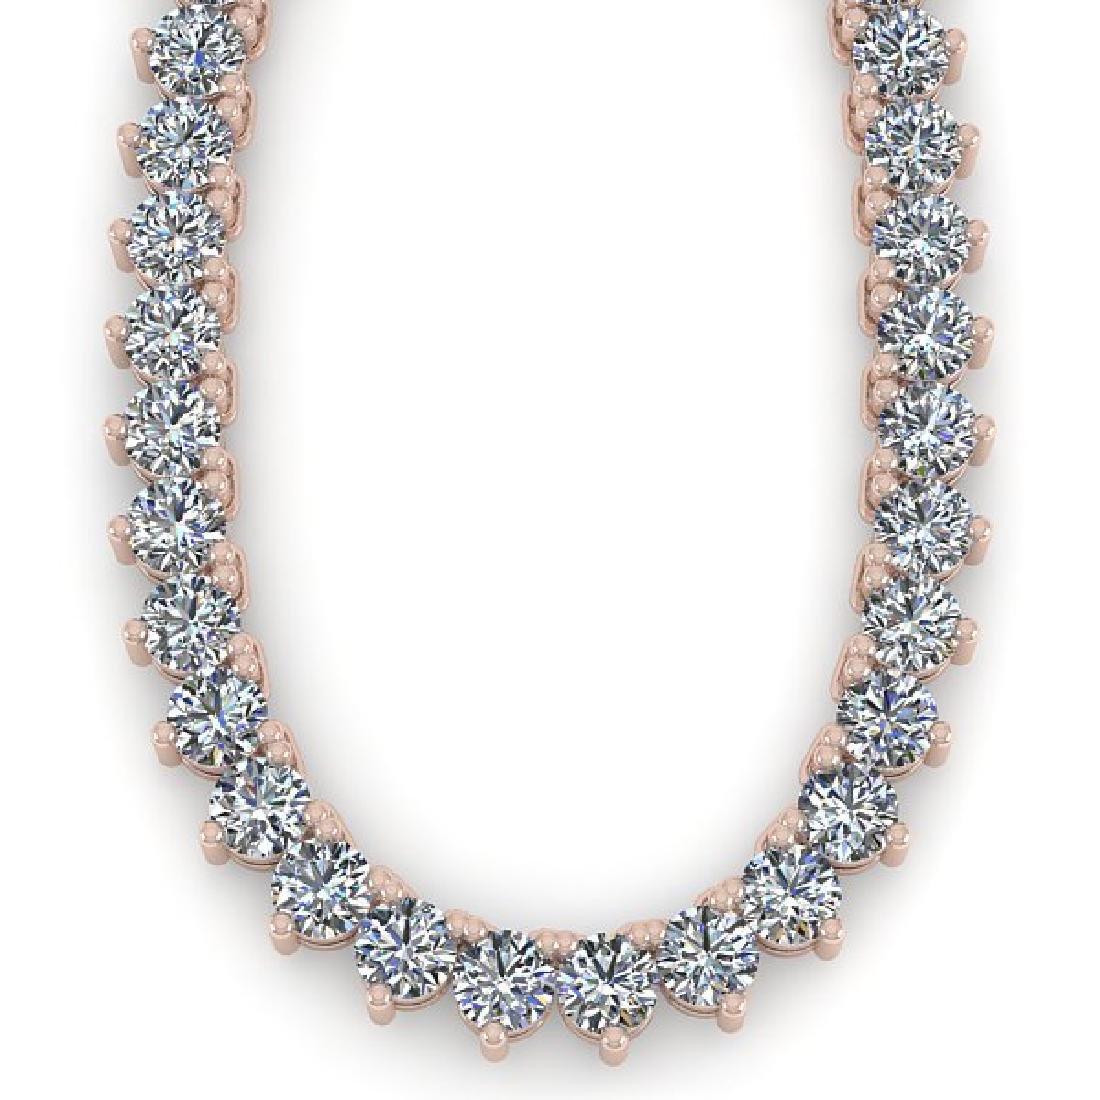 20 CTW Solitaire VS/SI Diamond Necklace 14K Rose Gold - 2